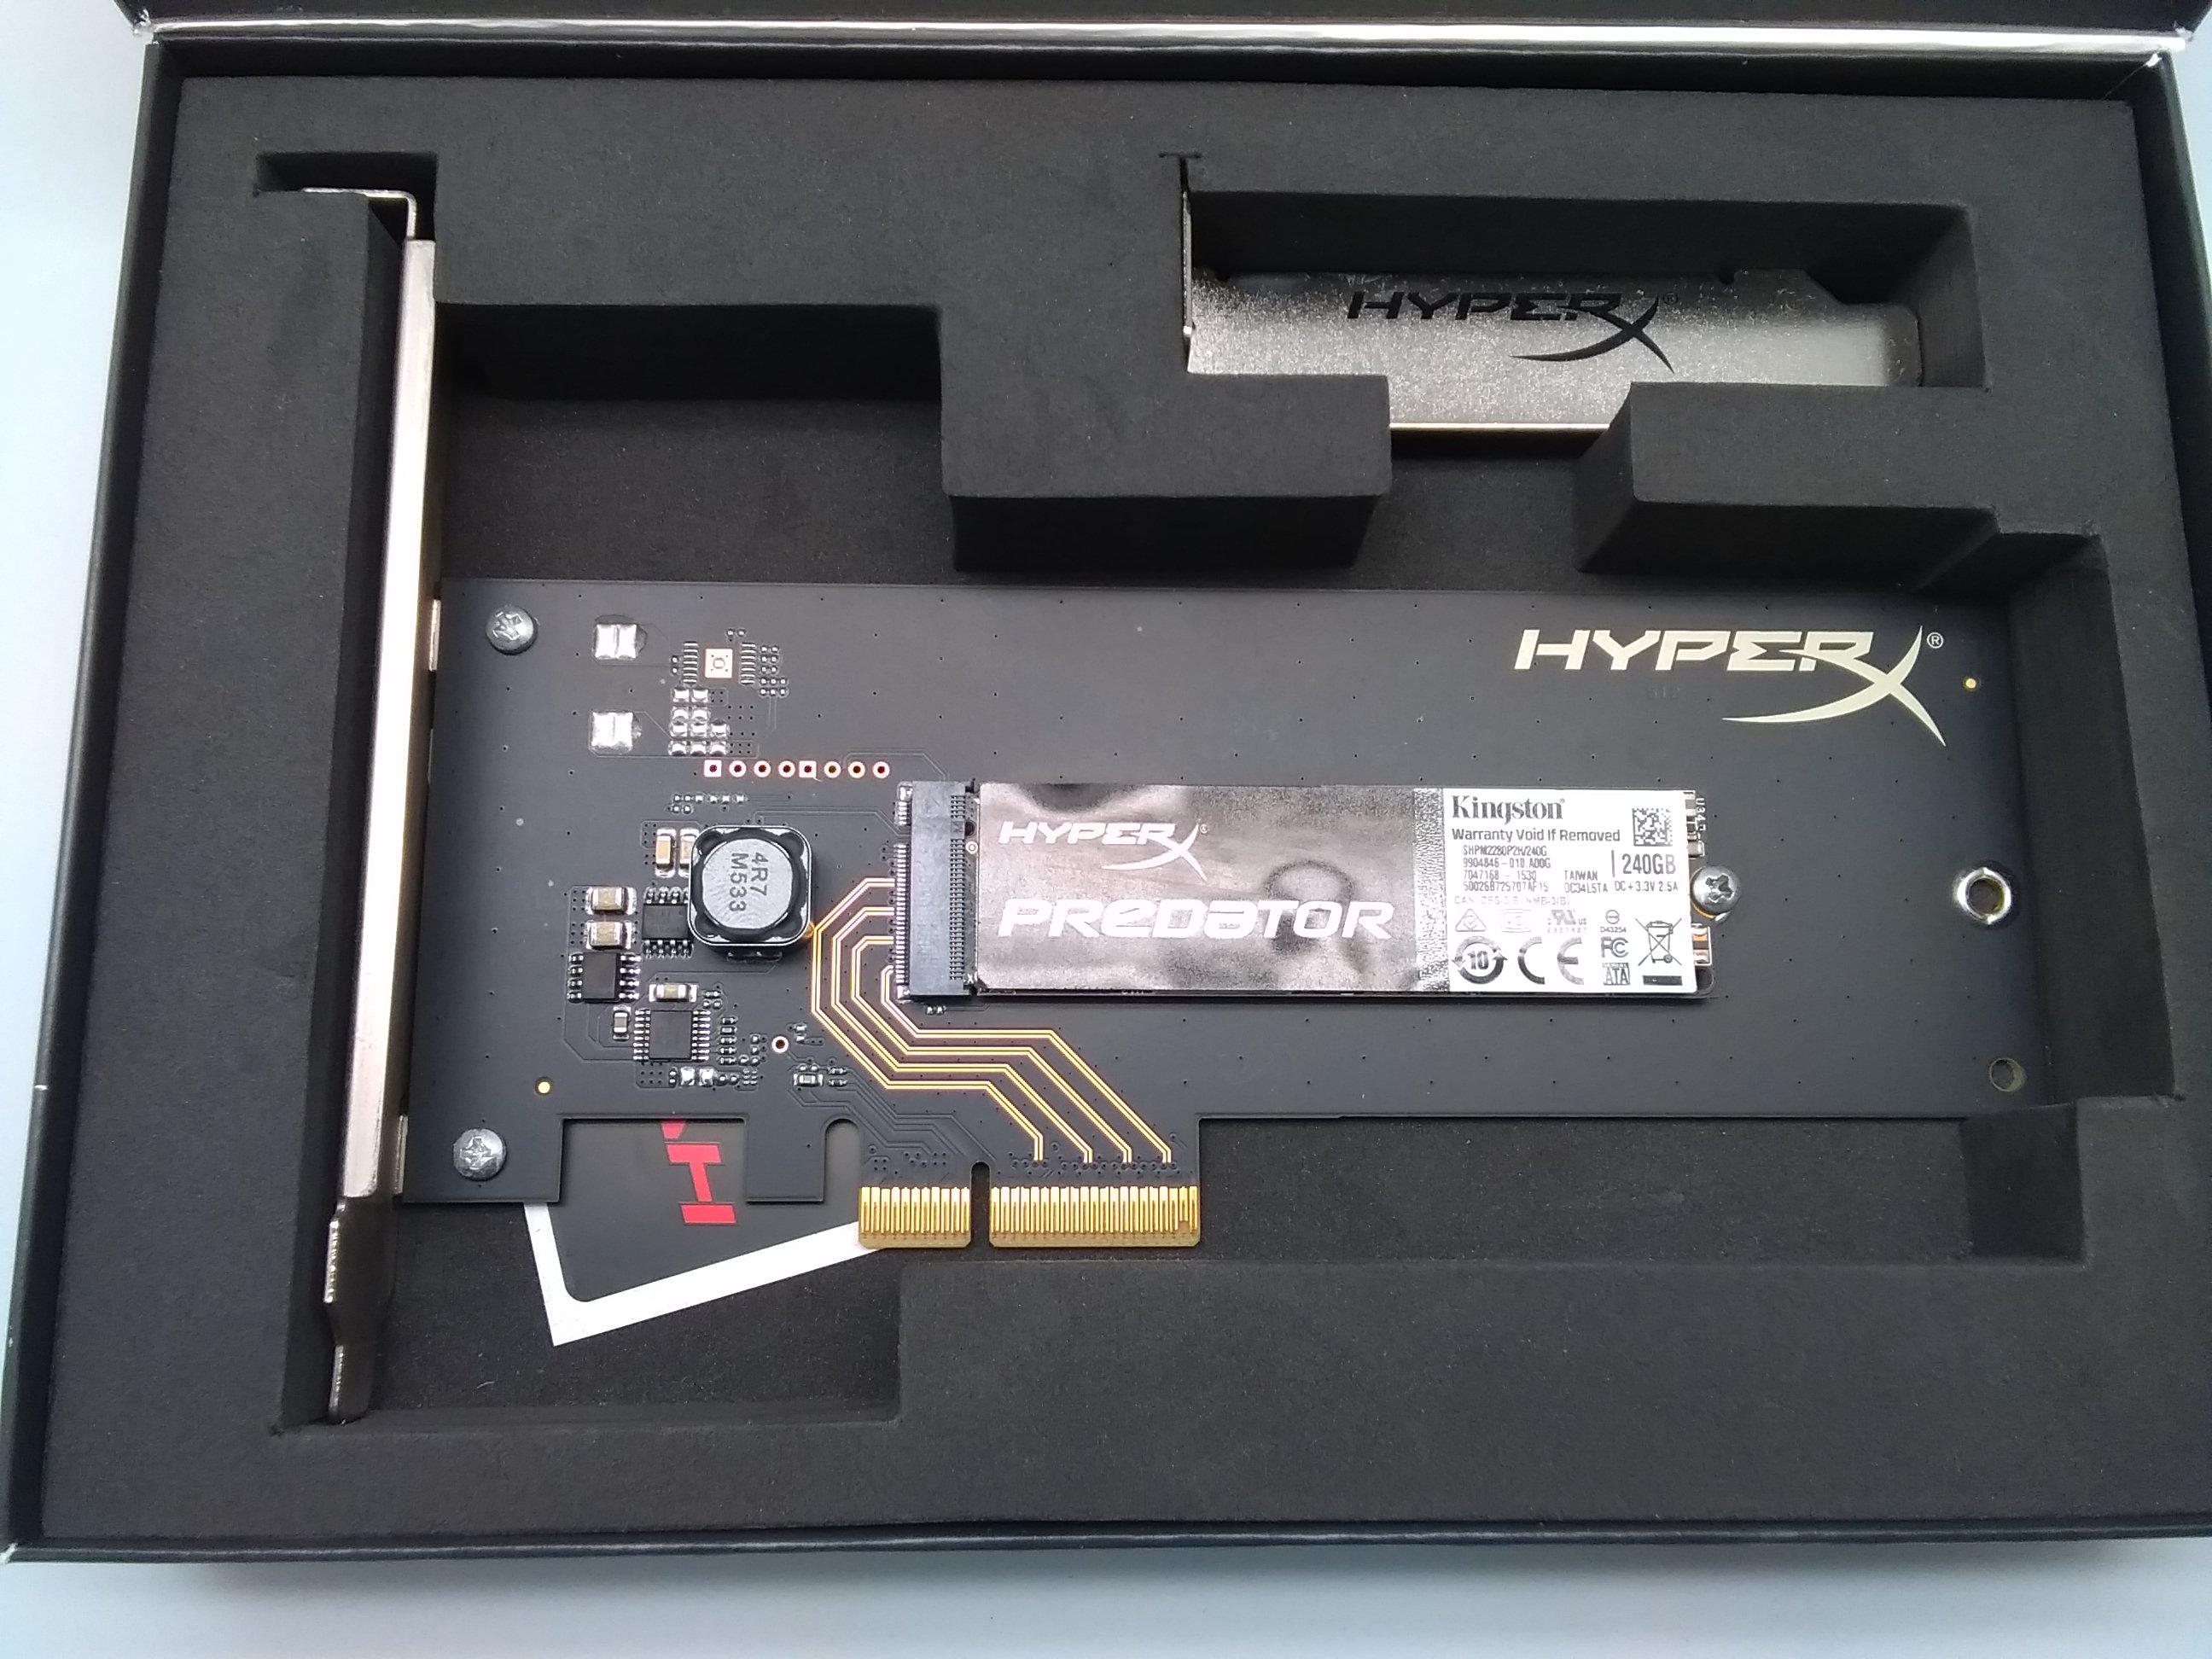 SSD 240GB SHPM2280P2H HYPER